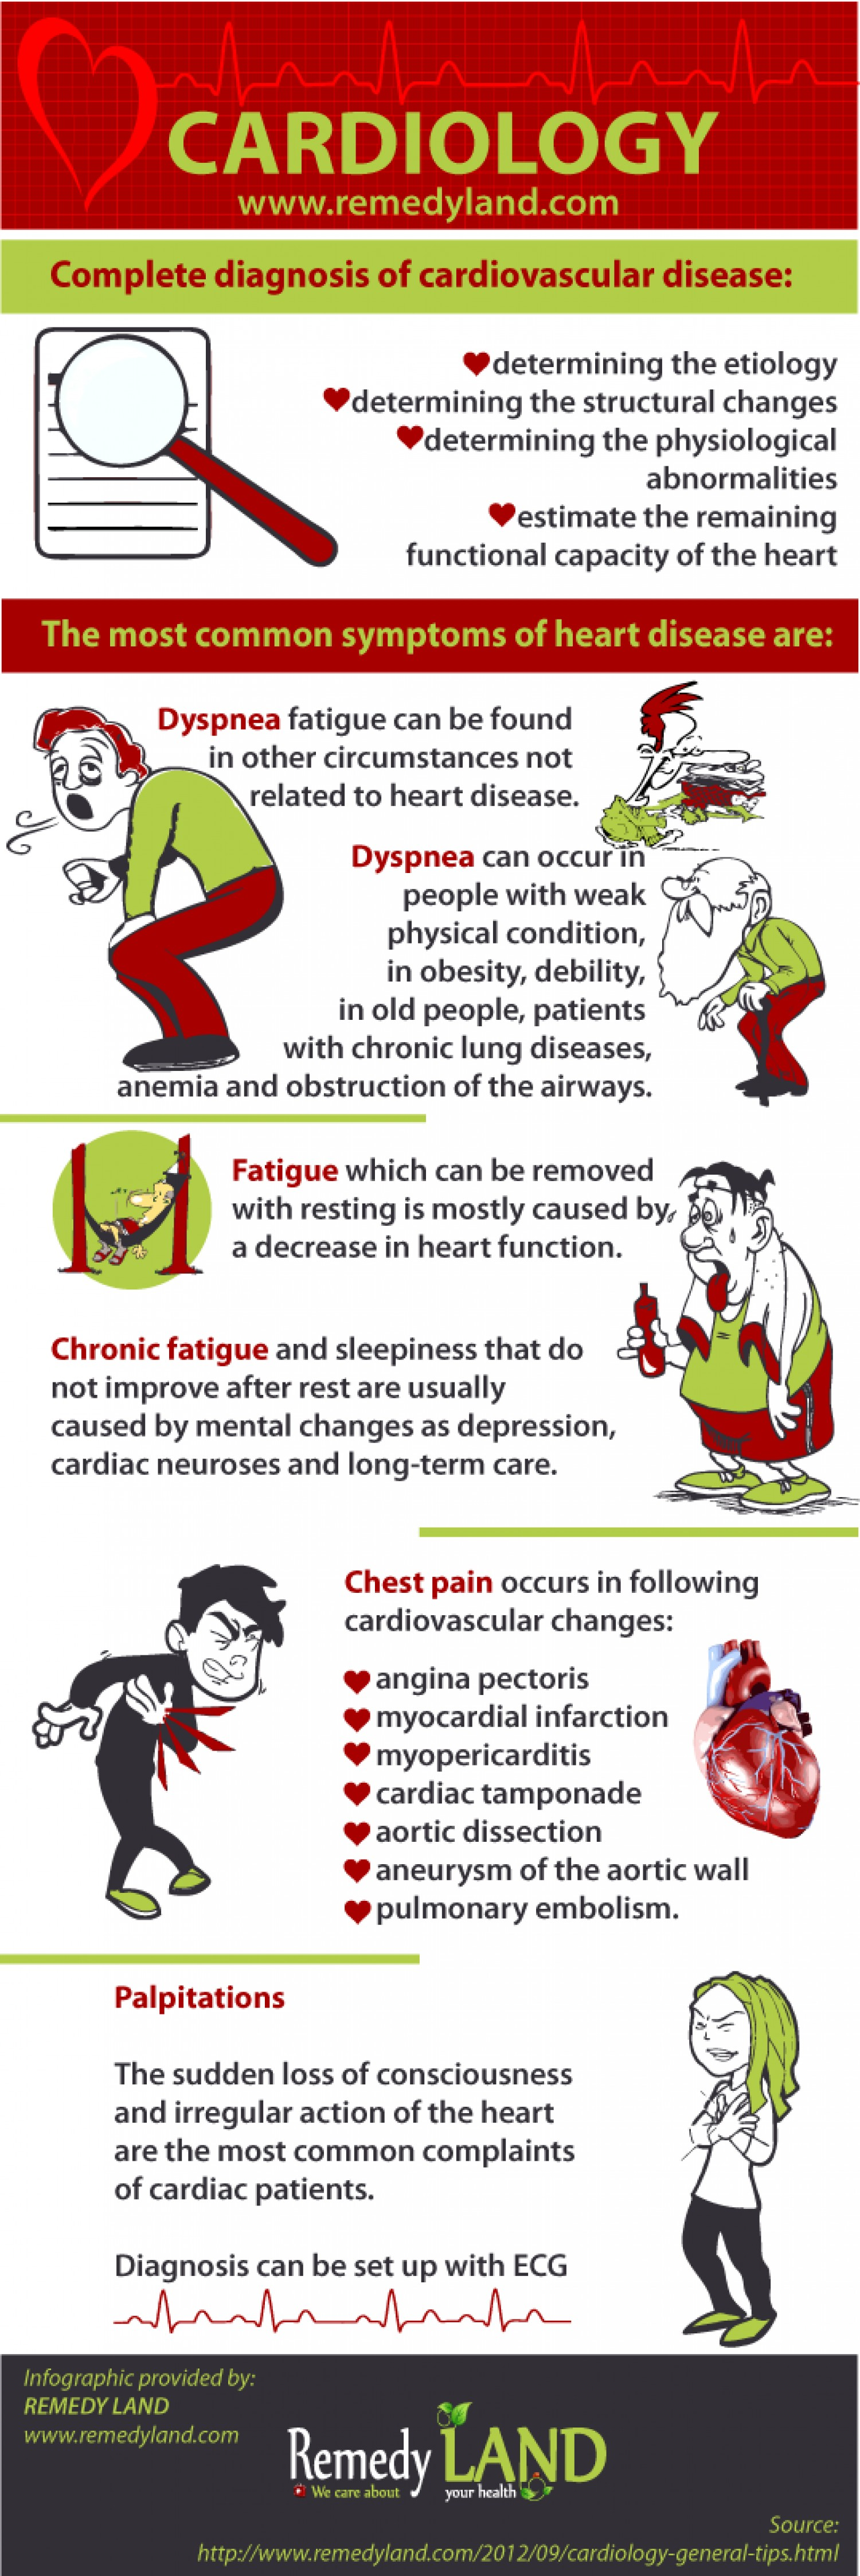 Common Symptoms of Heart Disease